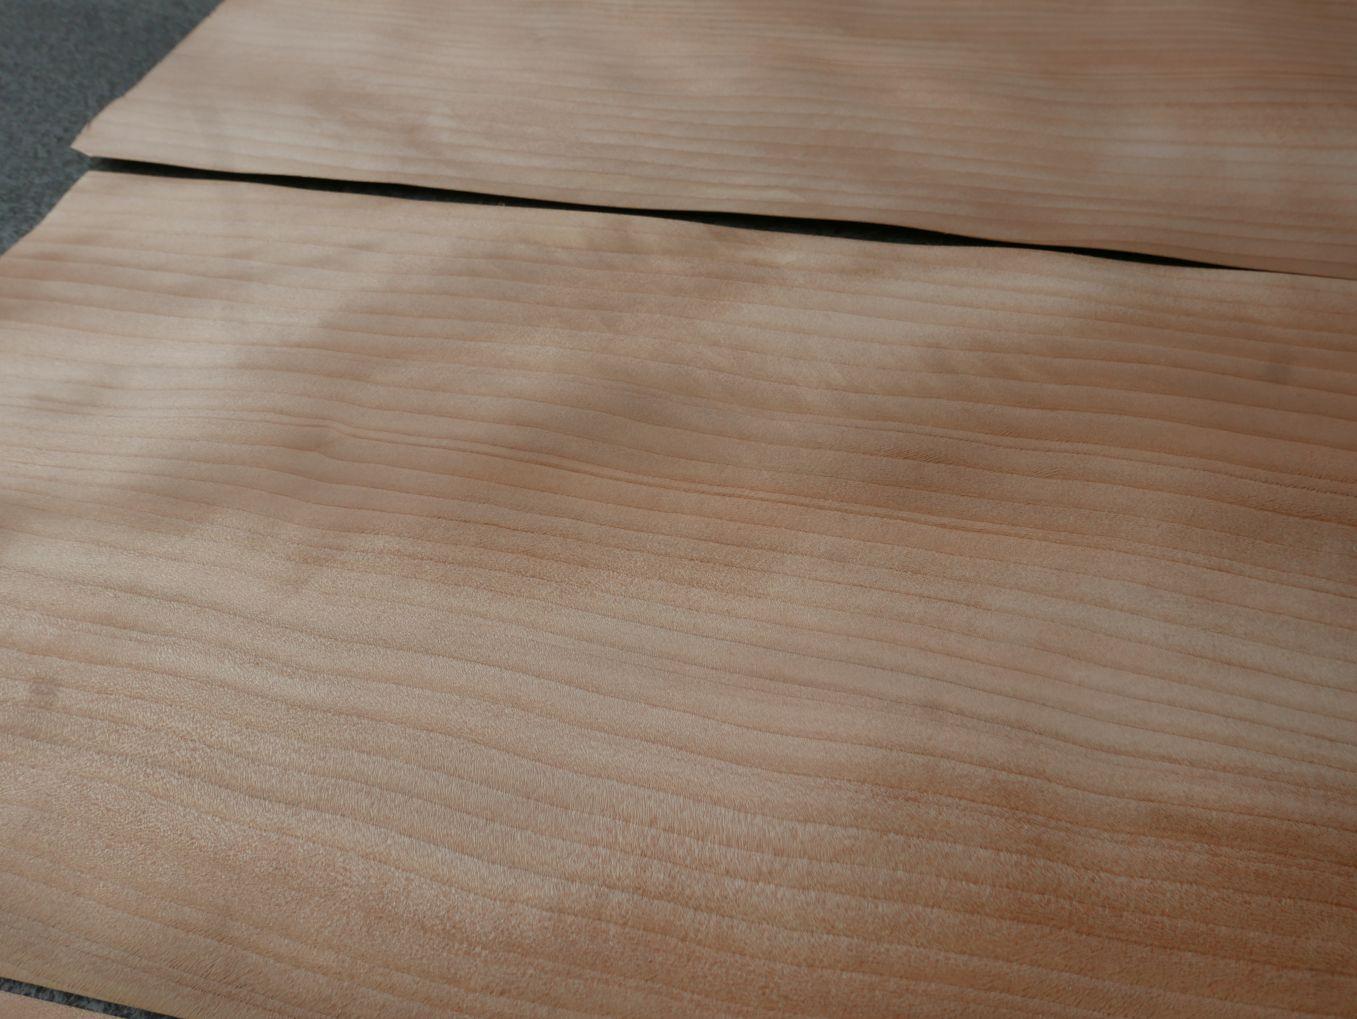 A0363-6 Libanon Ceder 30,5-31x120cm 24st